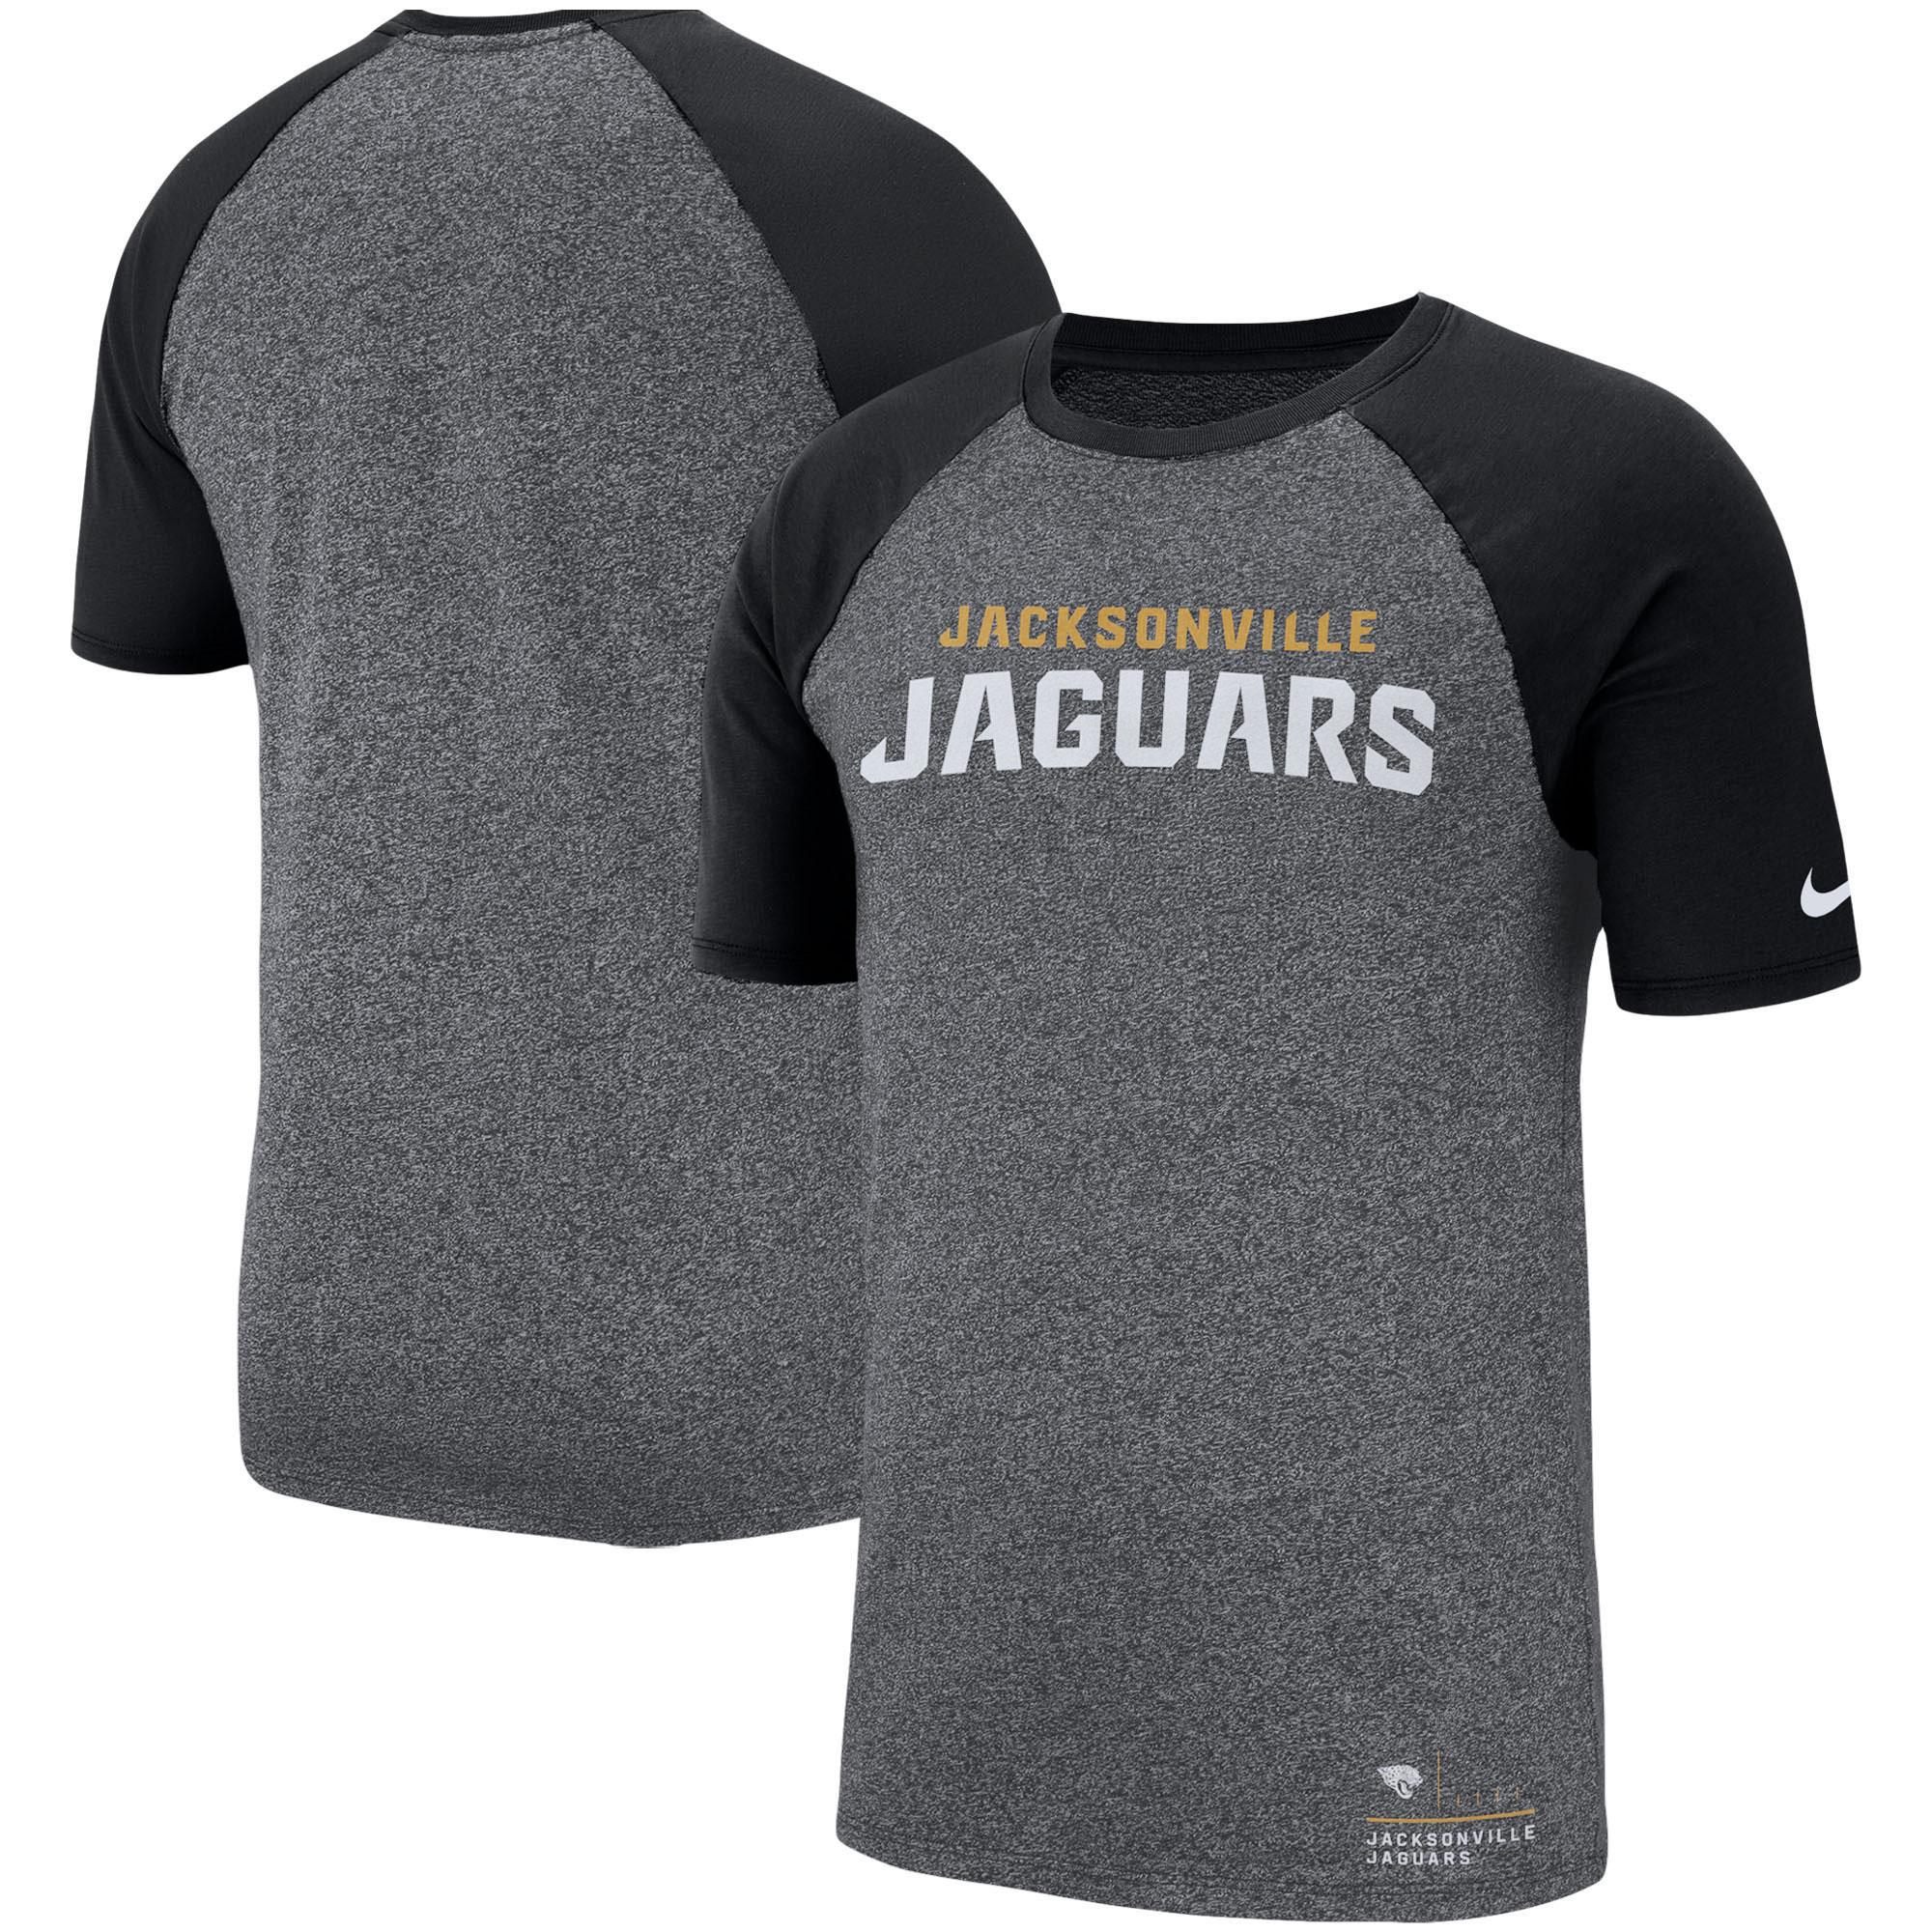 Jacksonville Jaguars Nike Fan Gear Marled Raglan Performance T-Shirt - Heathered Black